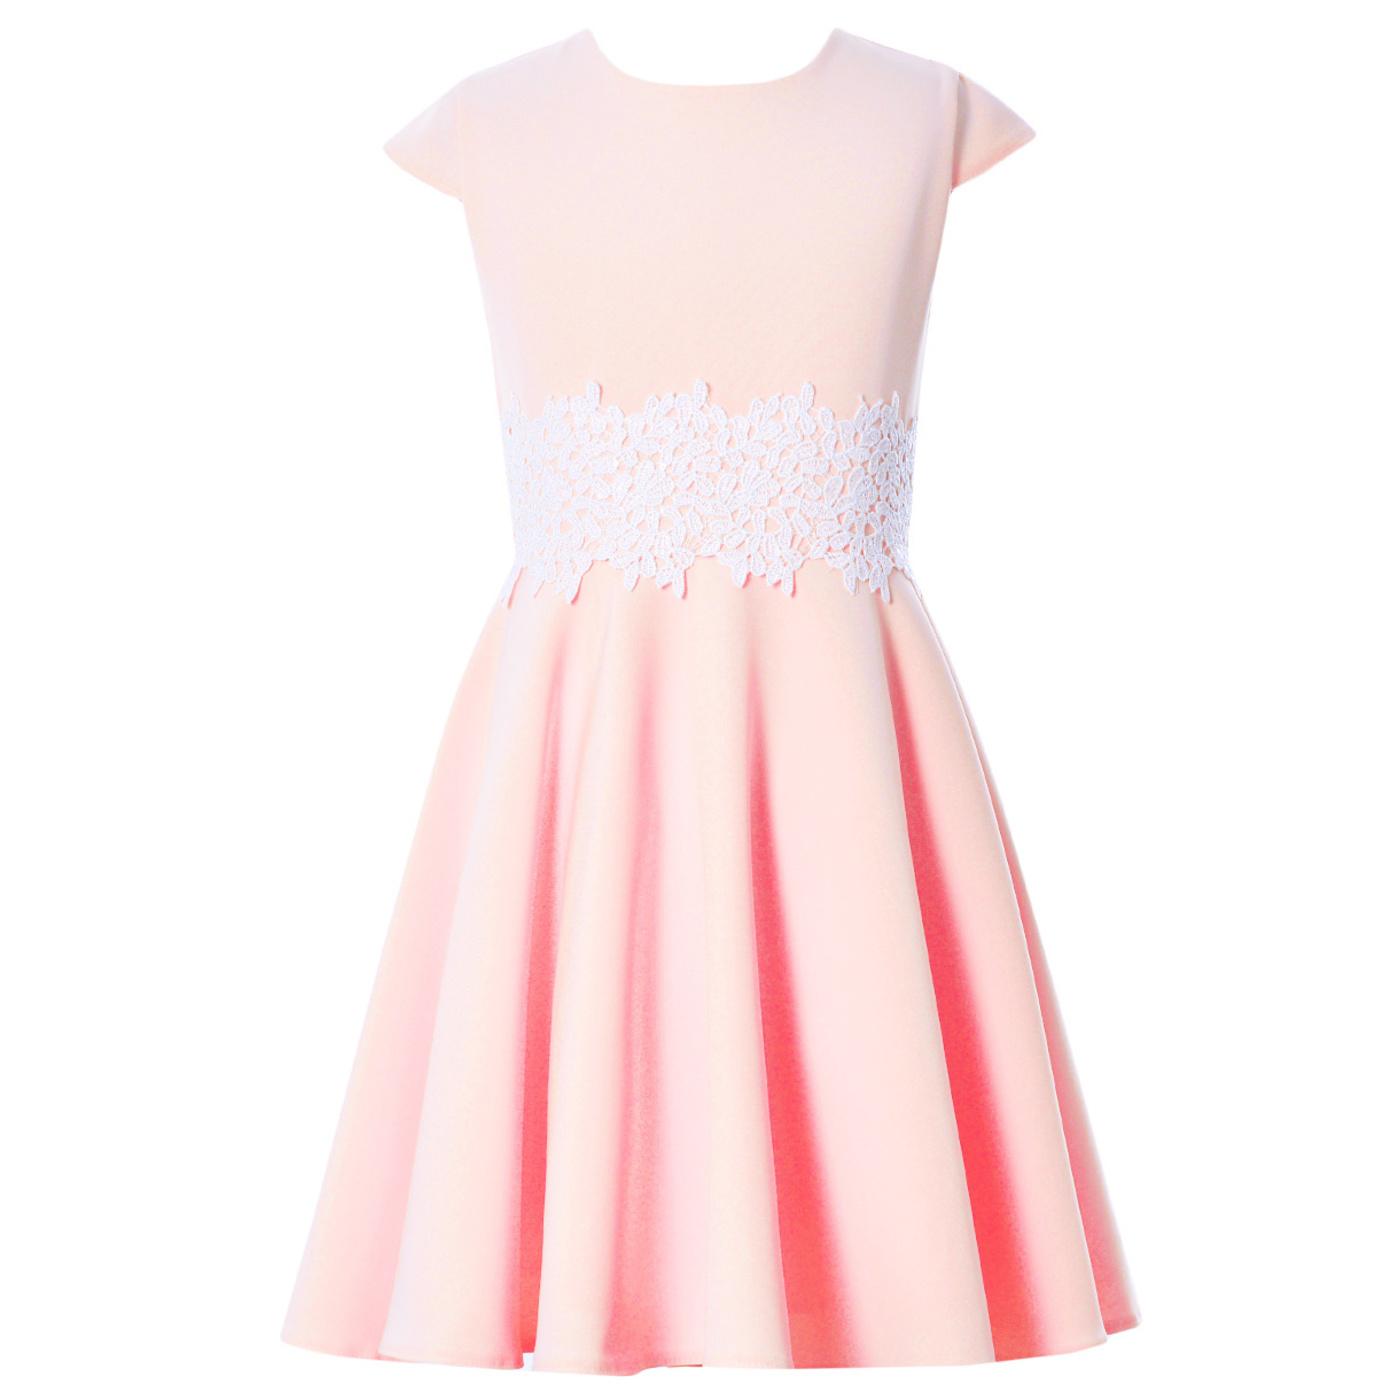 e89e1e02f7 Sukienka pokomunijna z koronką Barbi